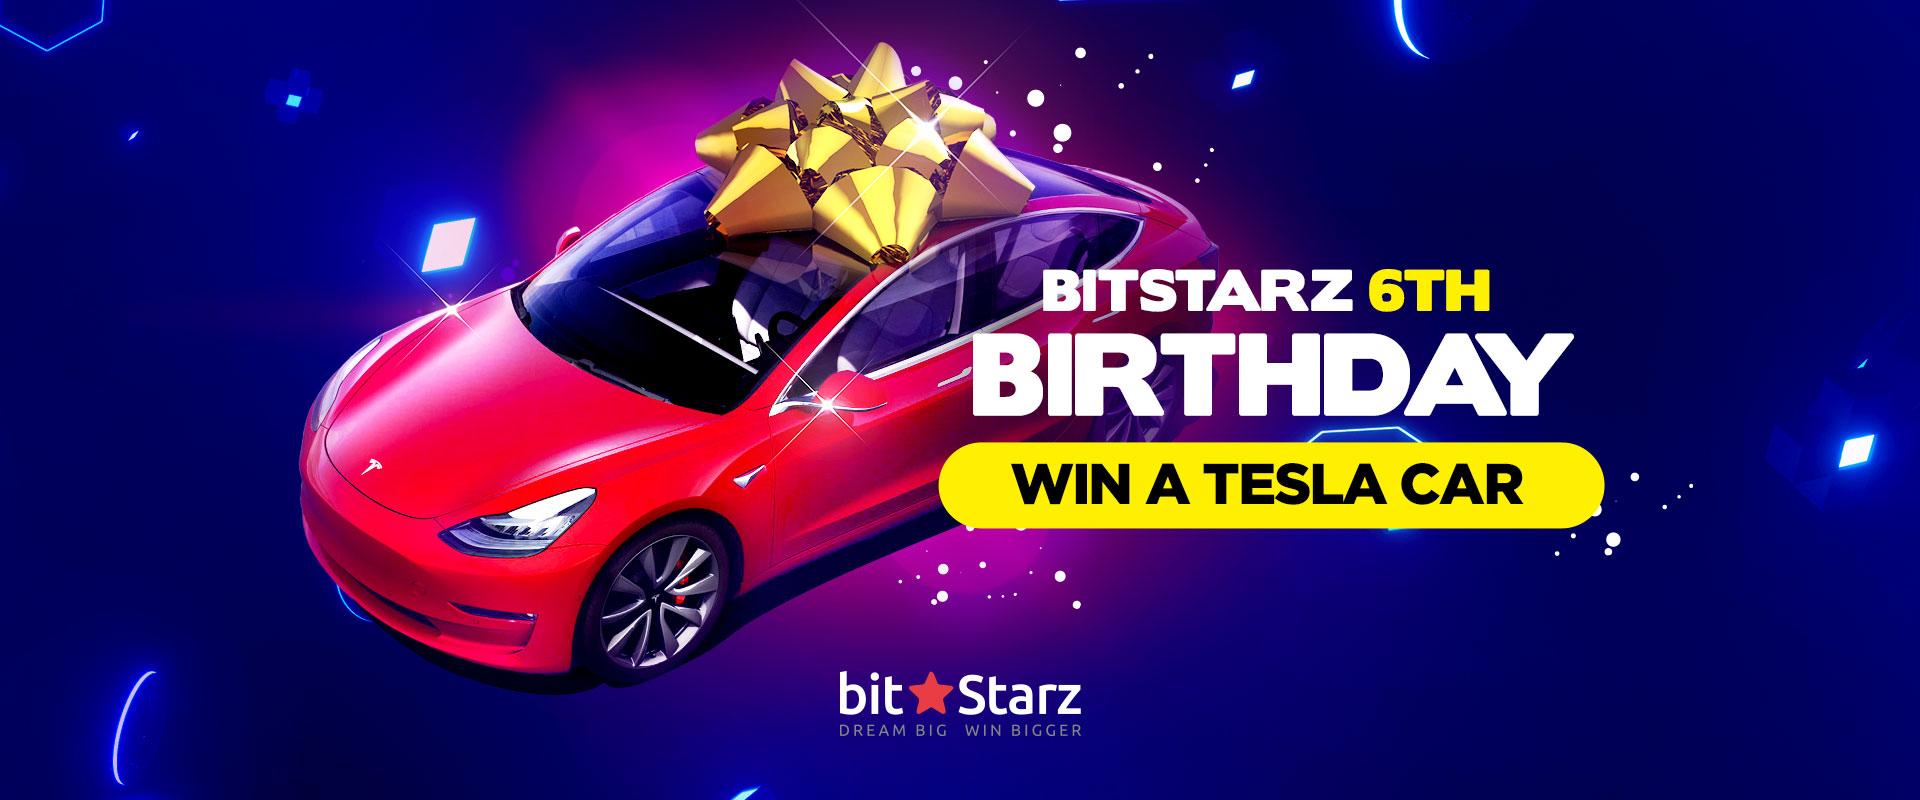 Celebrate BitStarz' Birthday and Win a Tesla Model 3!